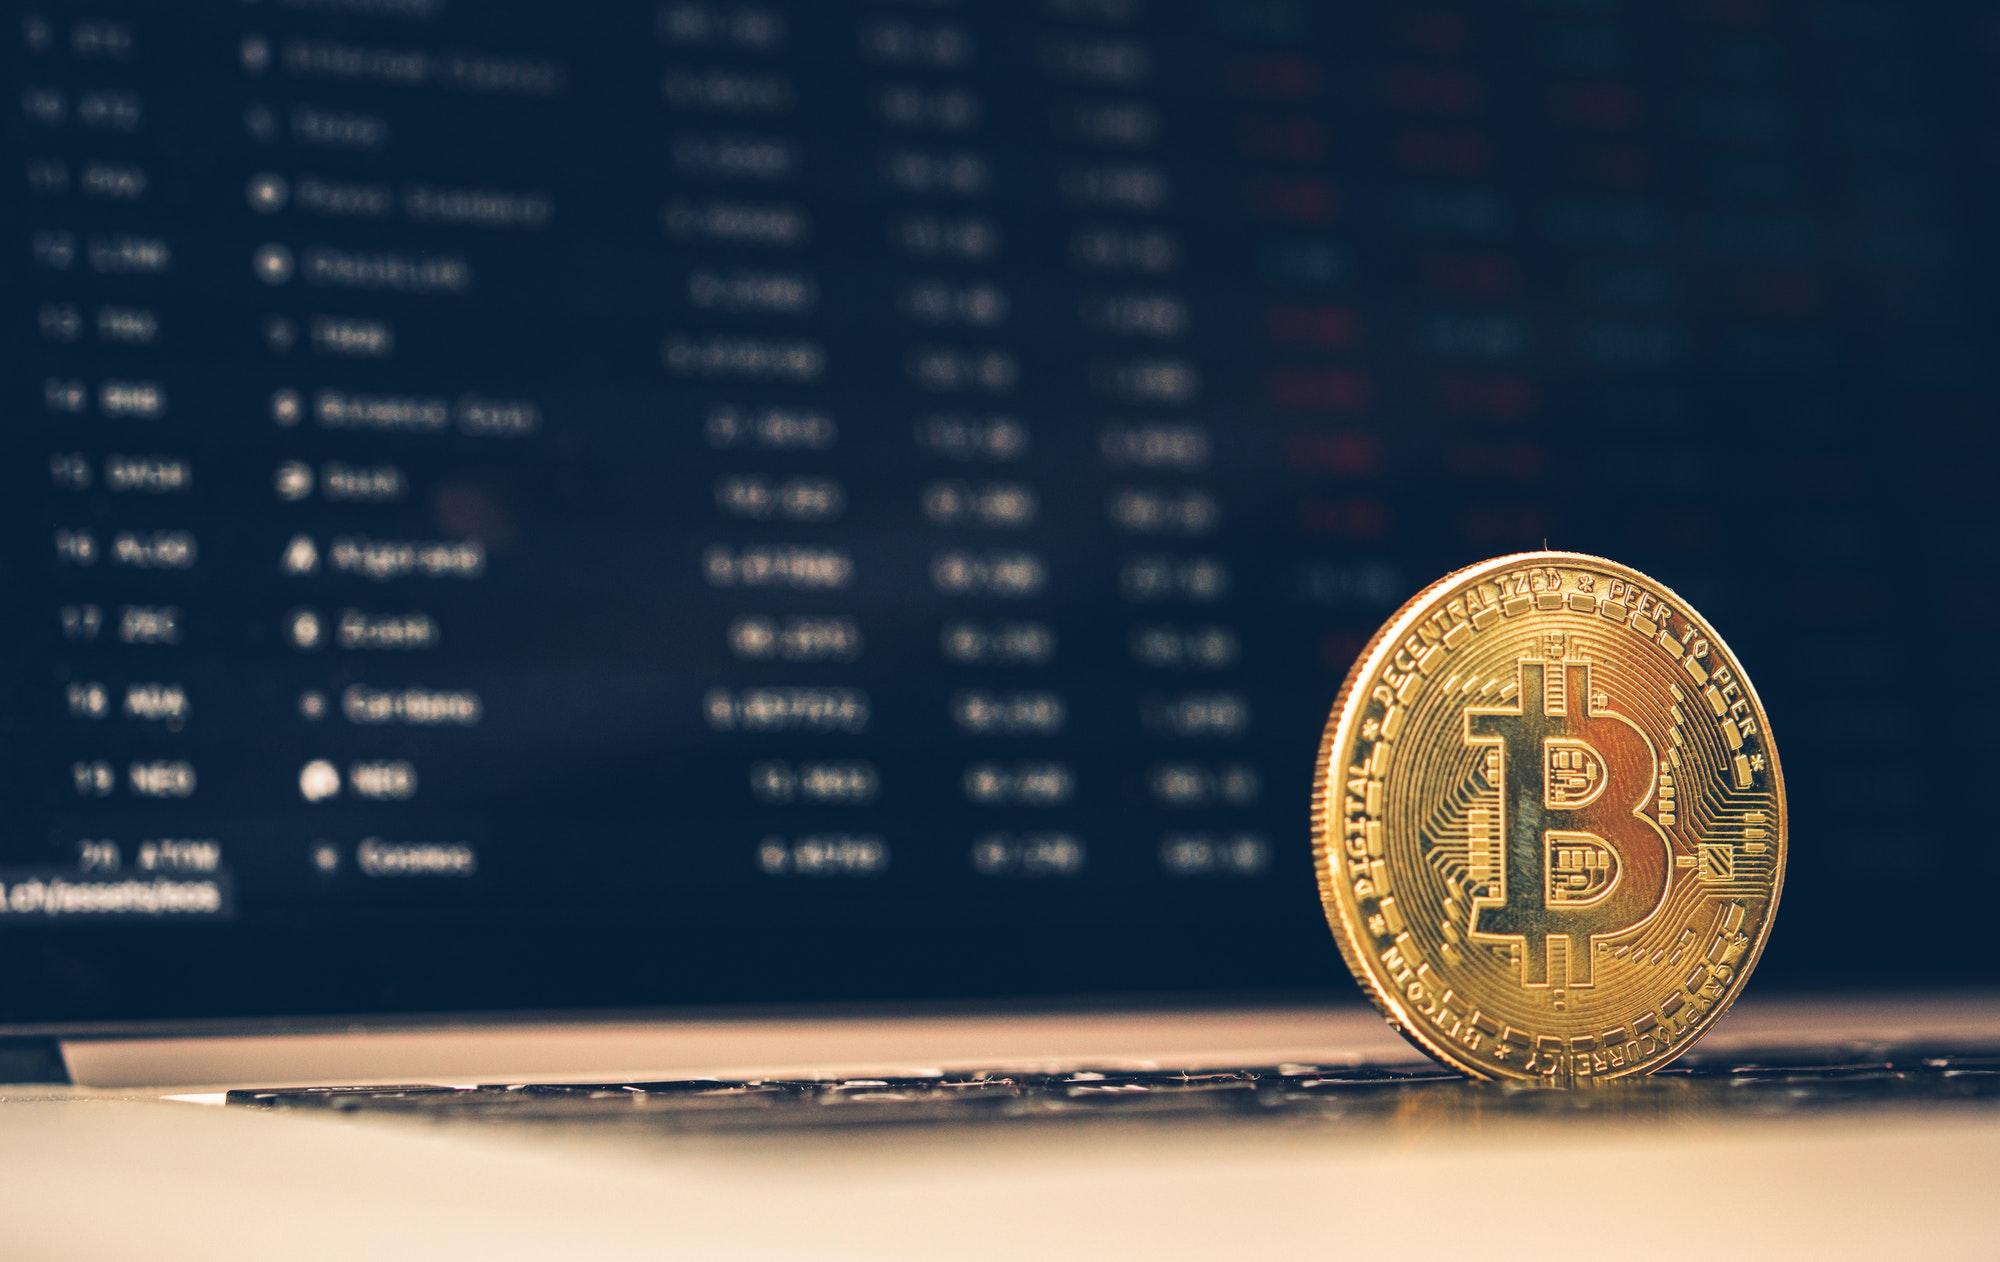 Golden Bitcoin Metal Symbolic Coin on Computer Keyboard